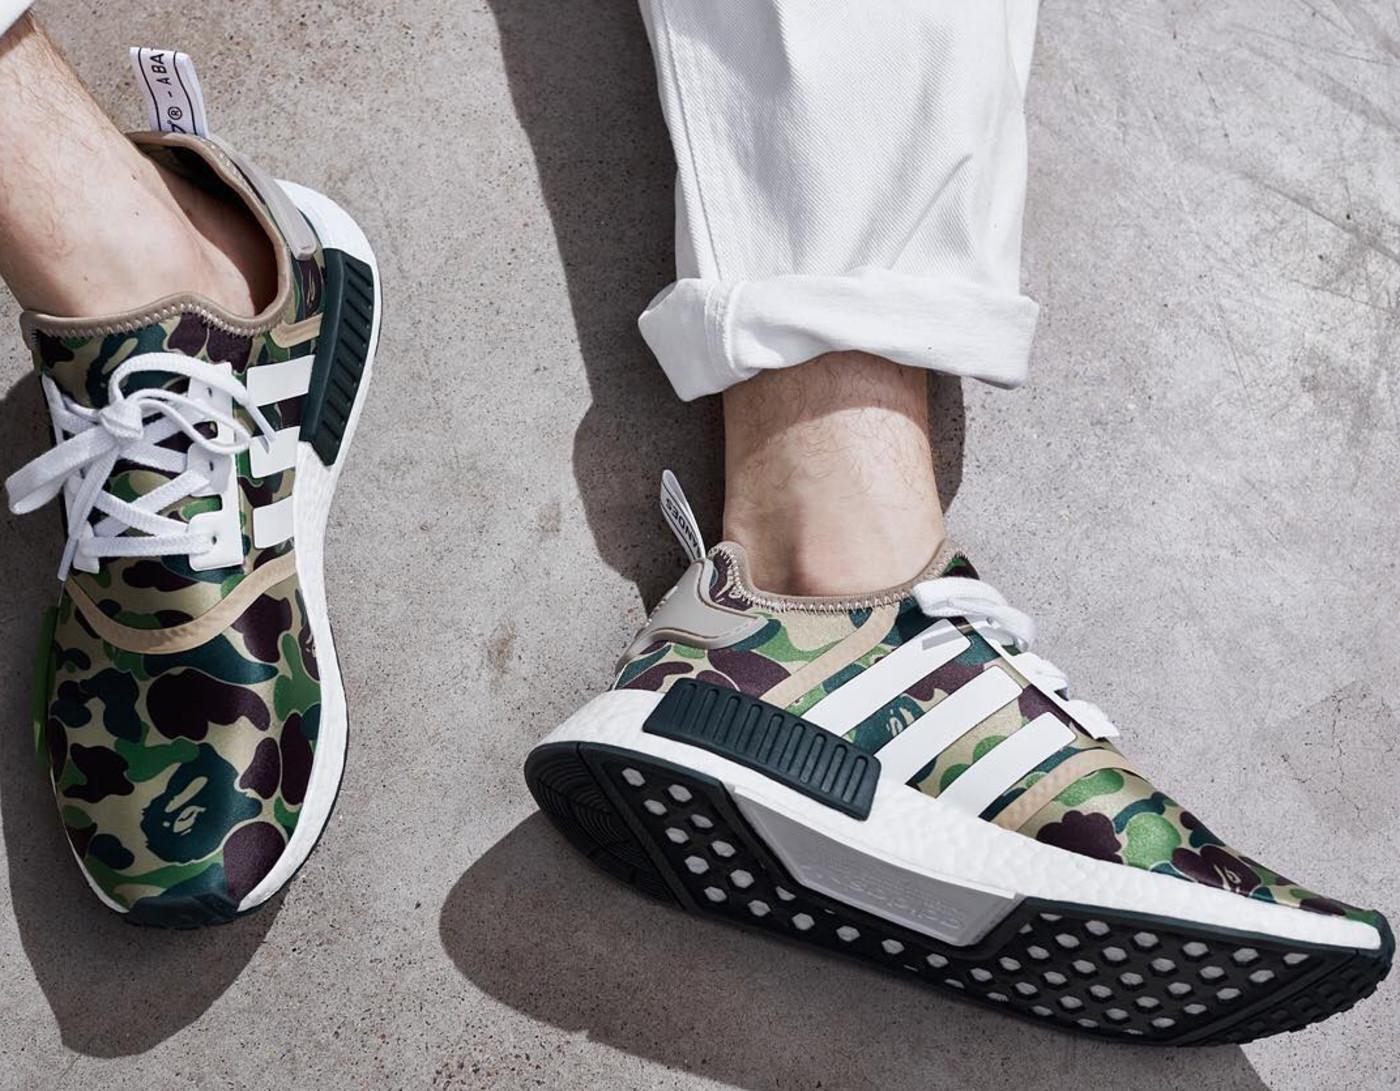 Bape Adidas NMD On Feet